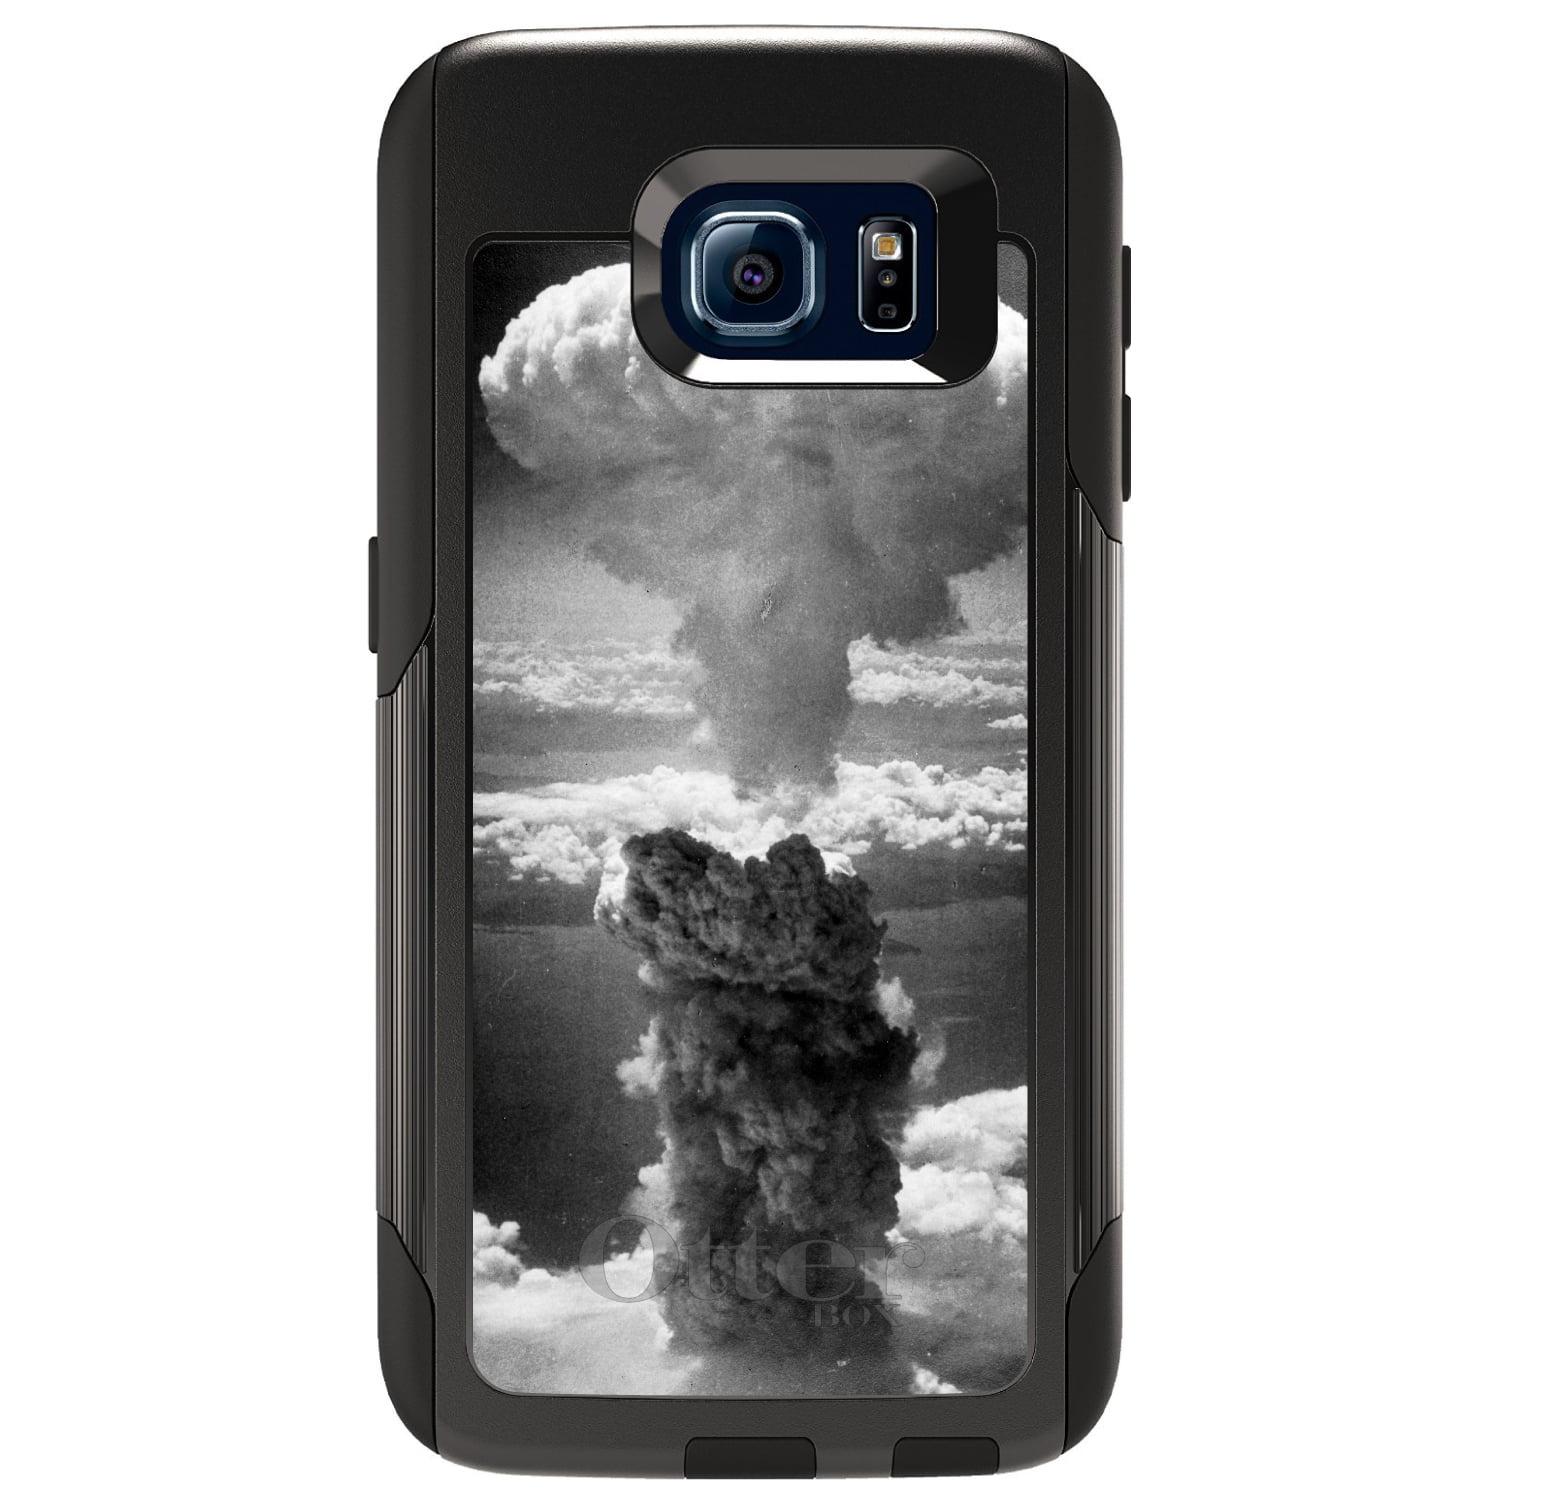 DistinctInk™ Custom Black OtterBox Commuter Series Case for Samsung Galaxy S6 - Nuclear Mushroom Cloud